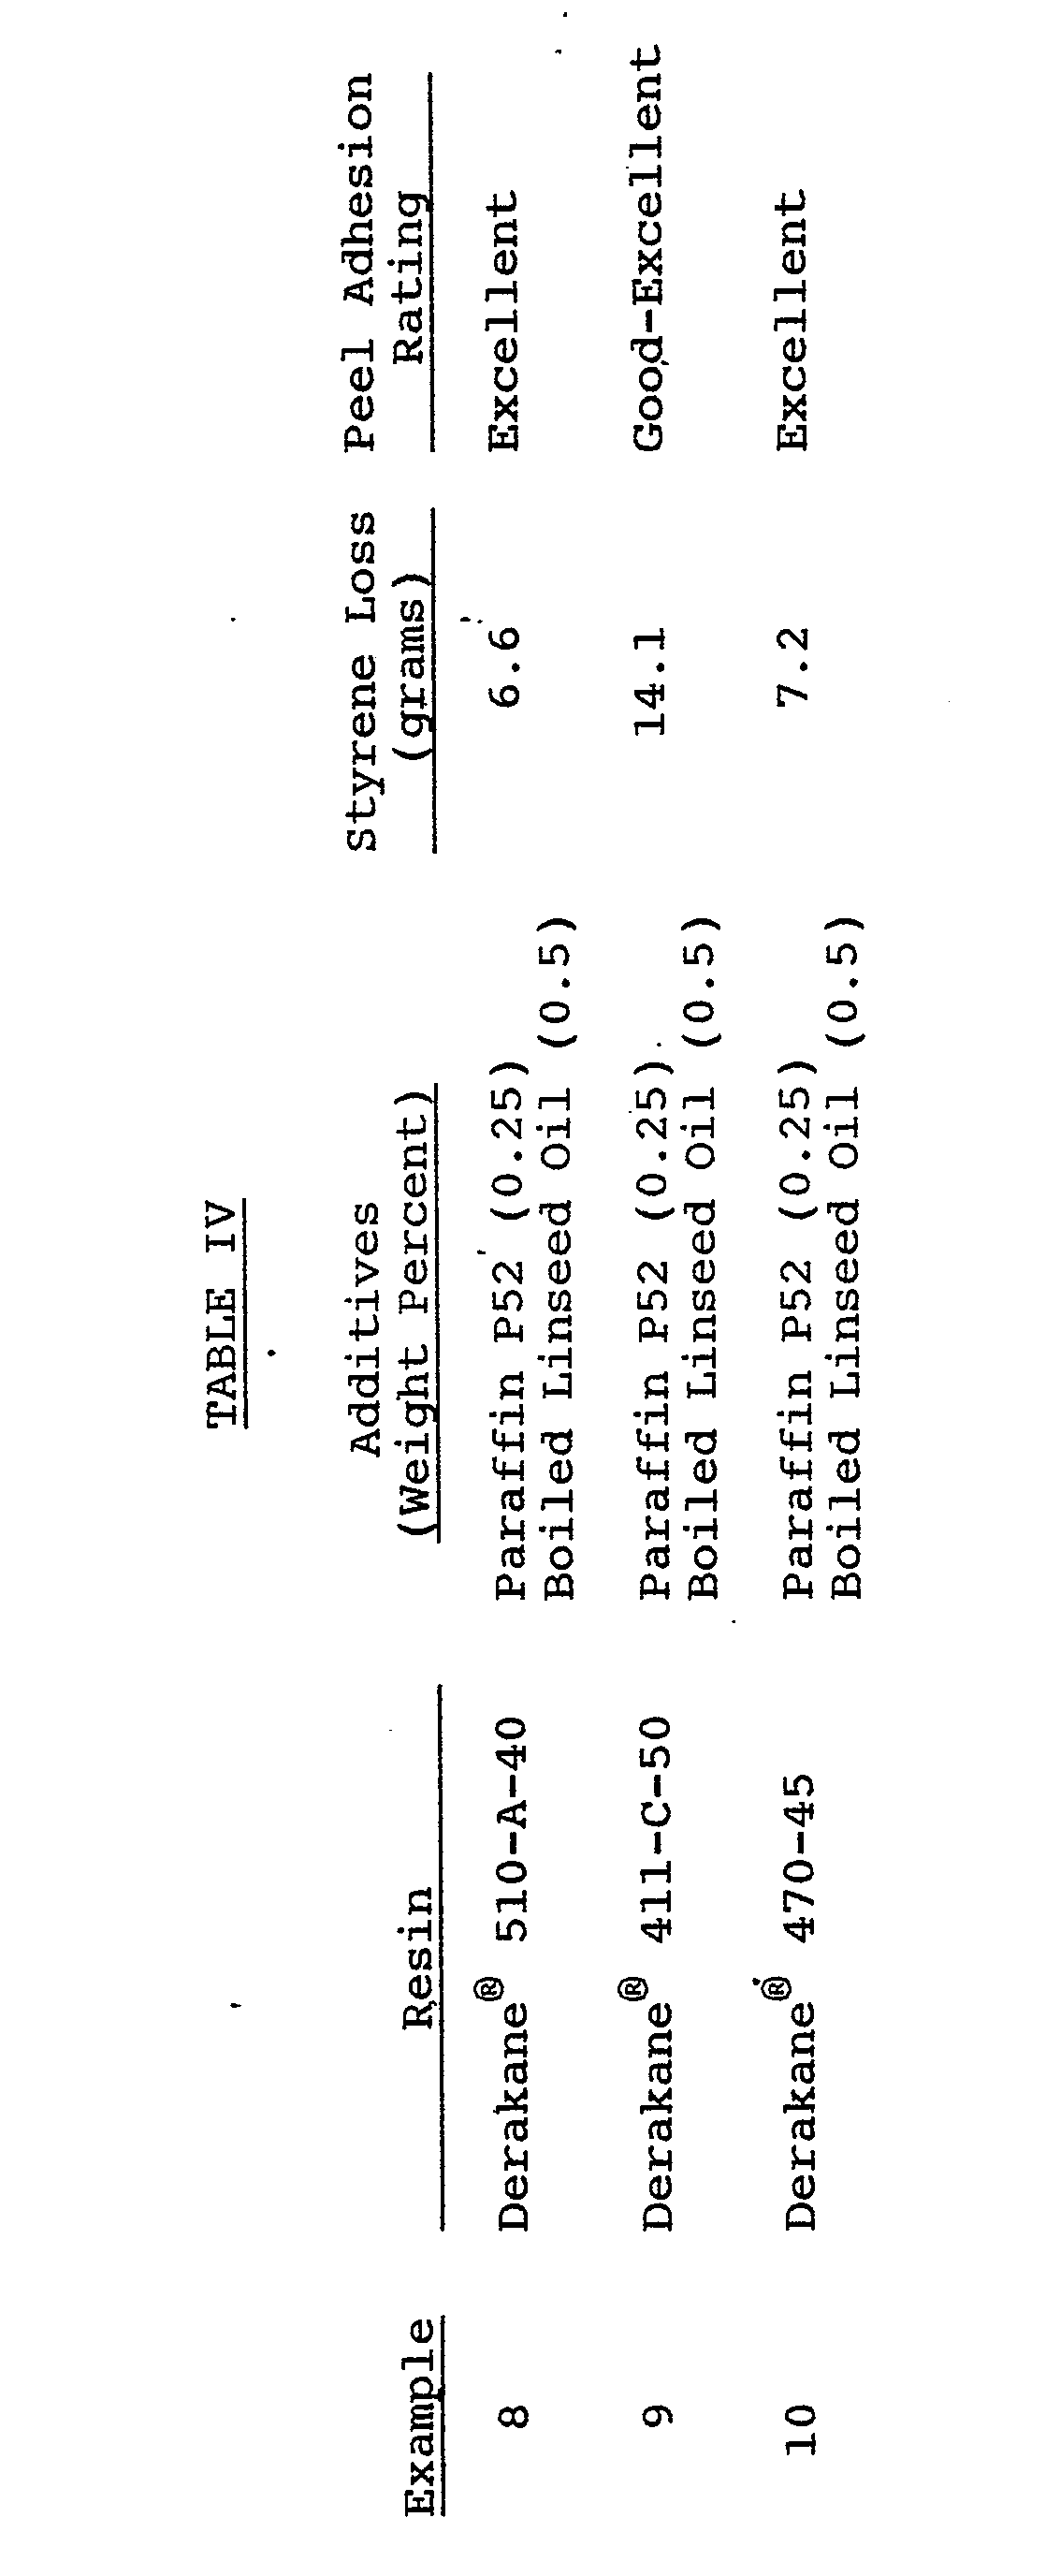 EP0205017A2 - Low styrene emission vinyl ester resin employing